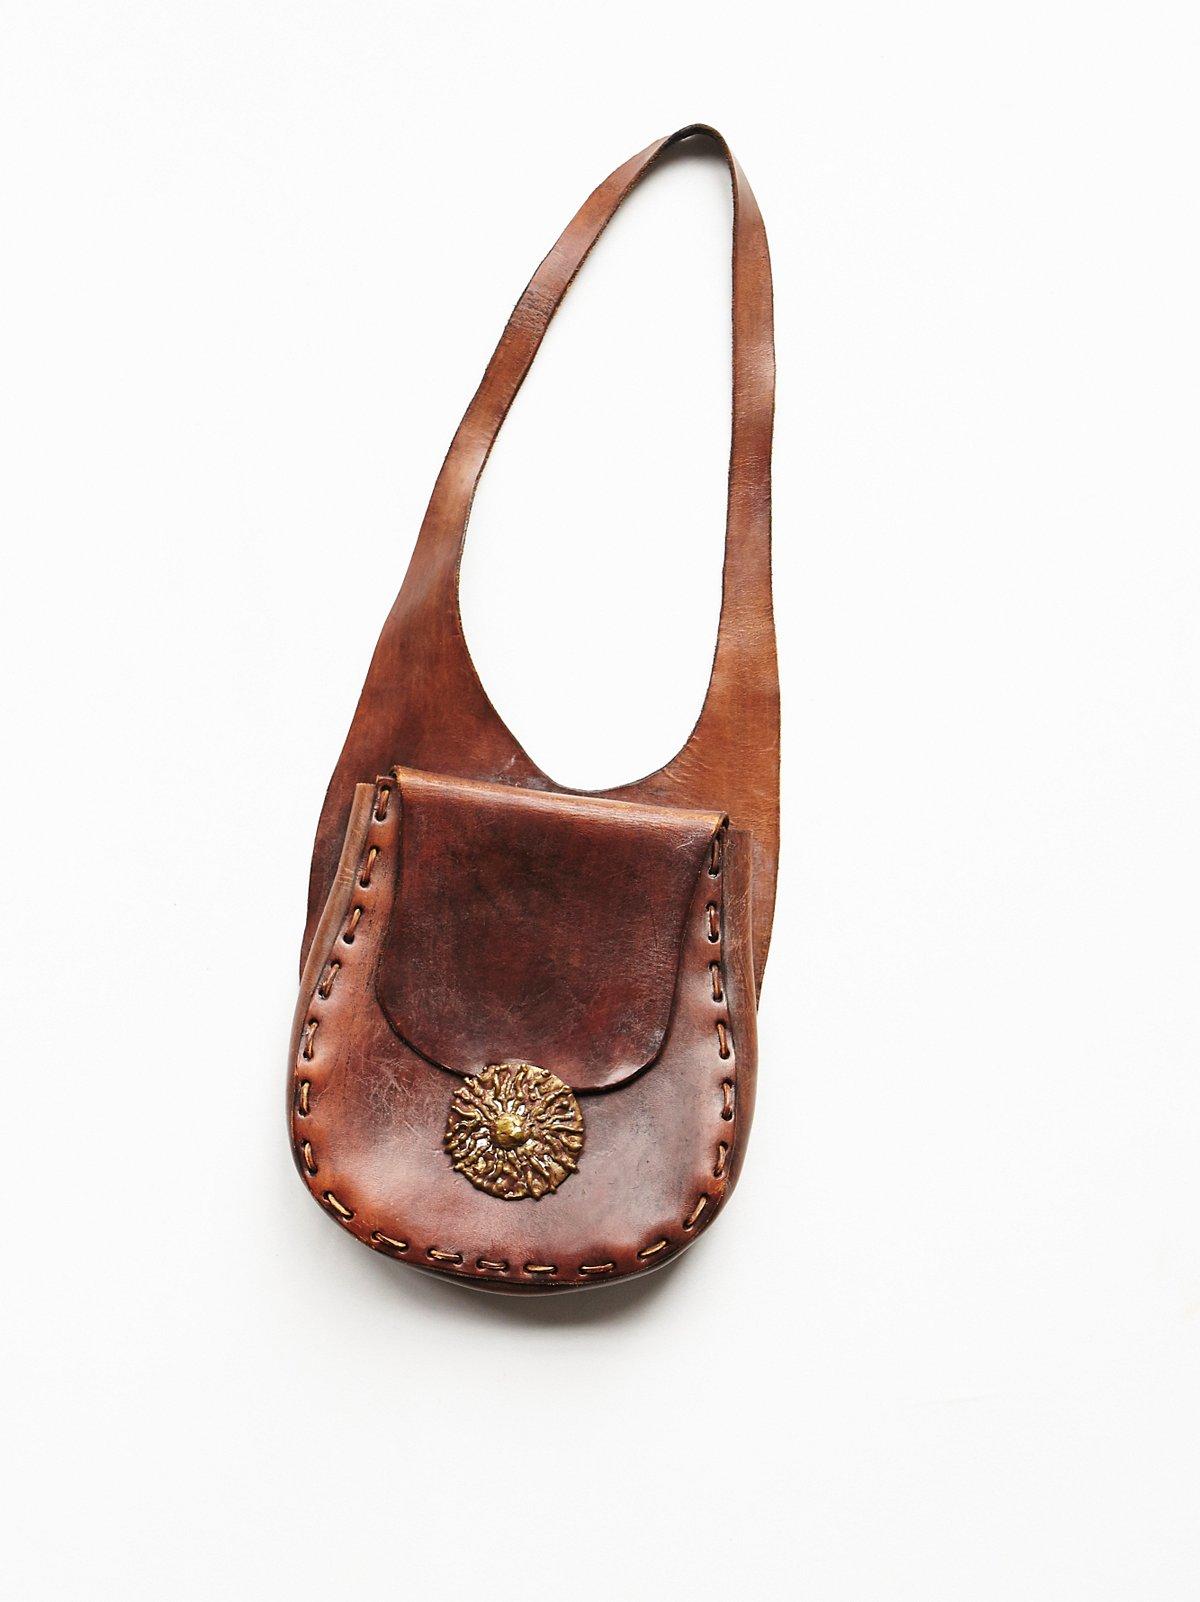 Vintage '70s Brown Leather Bag